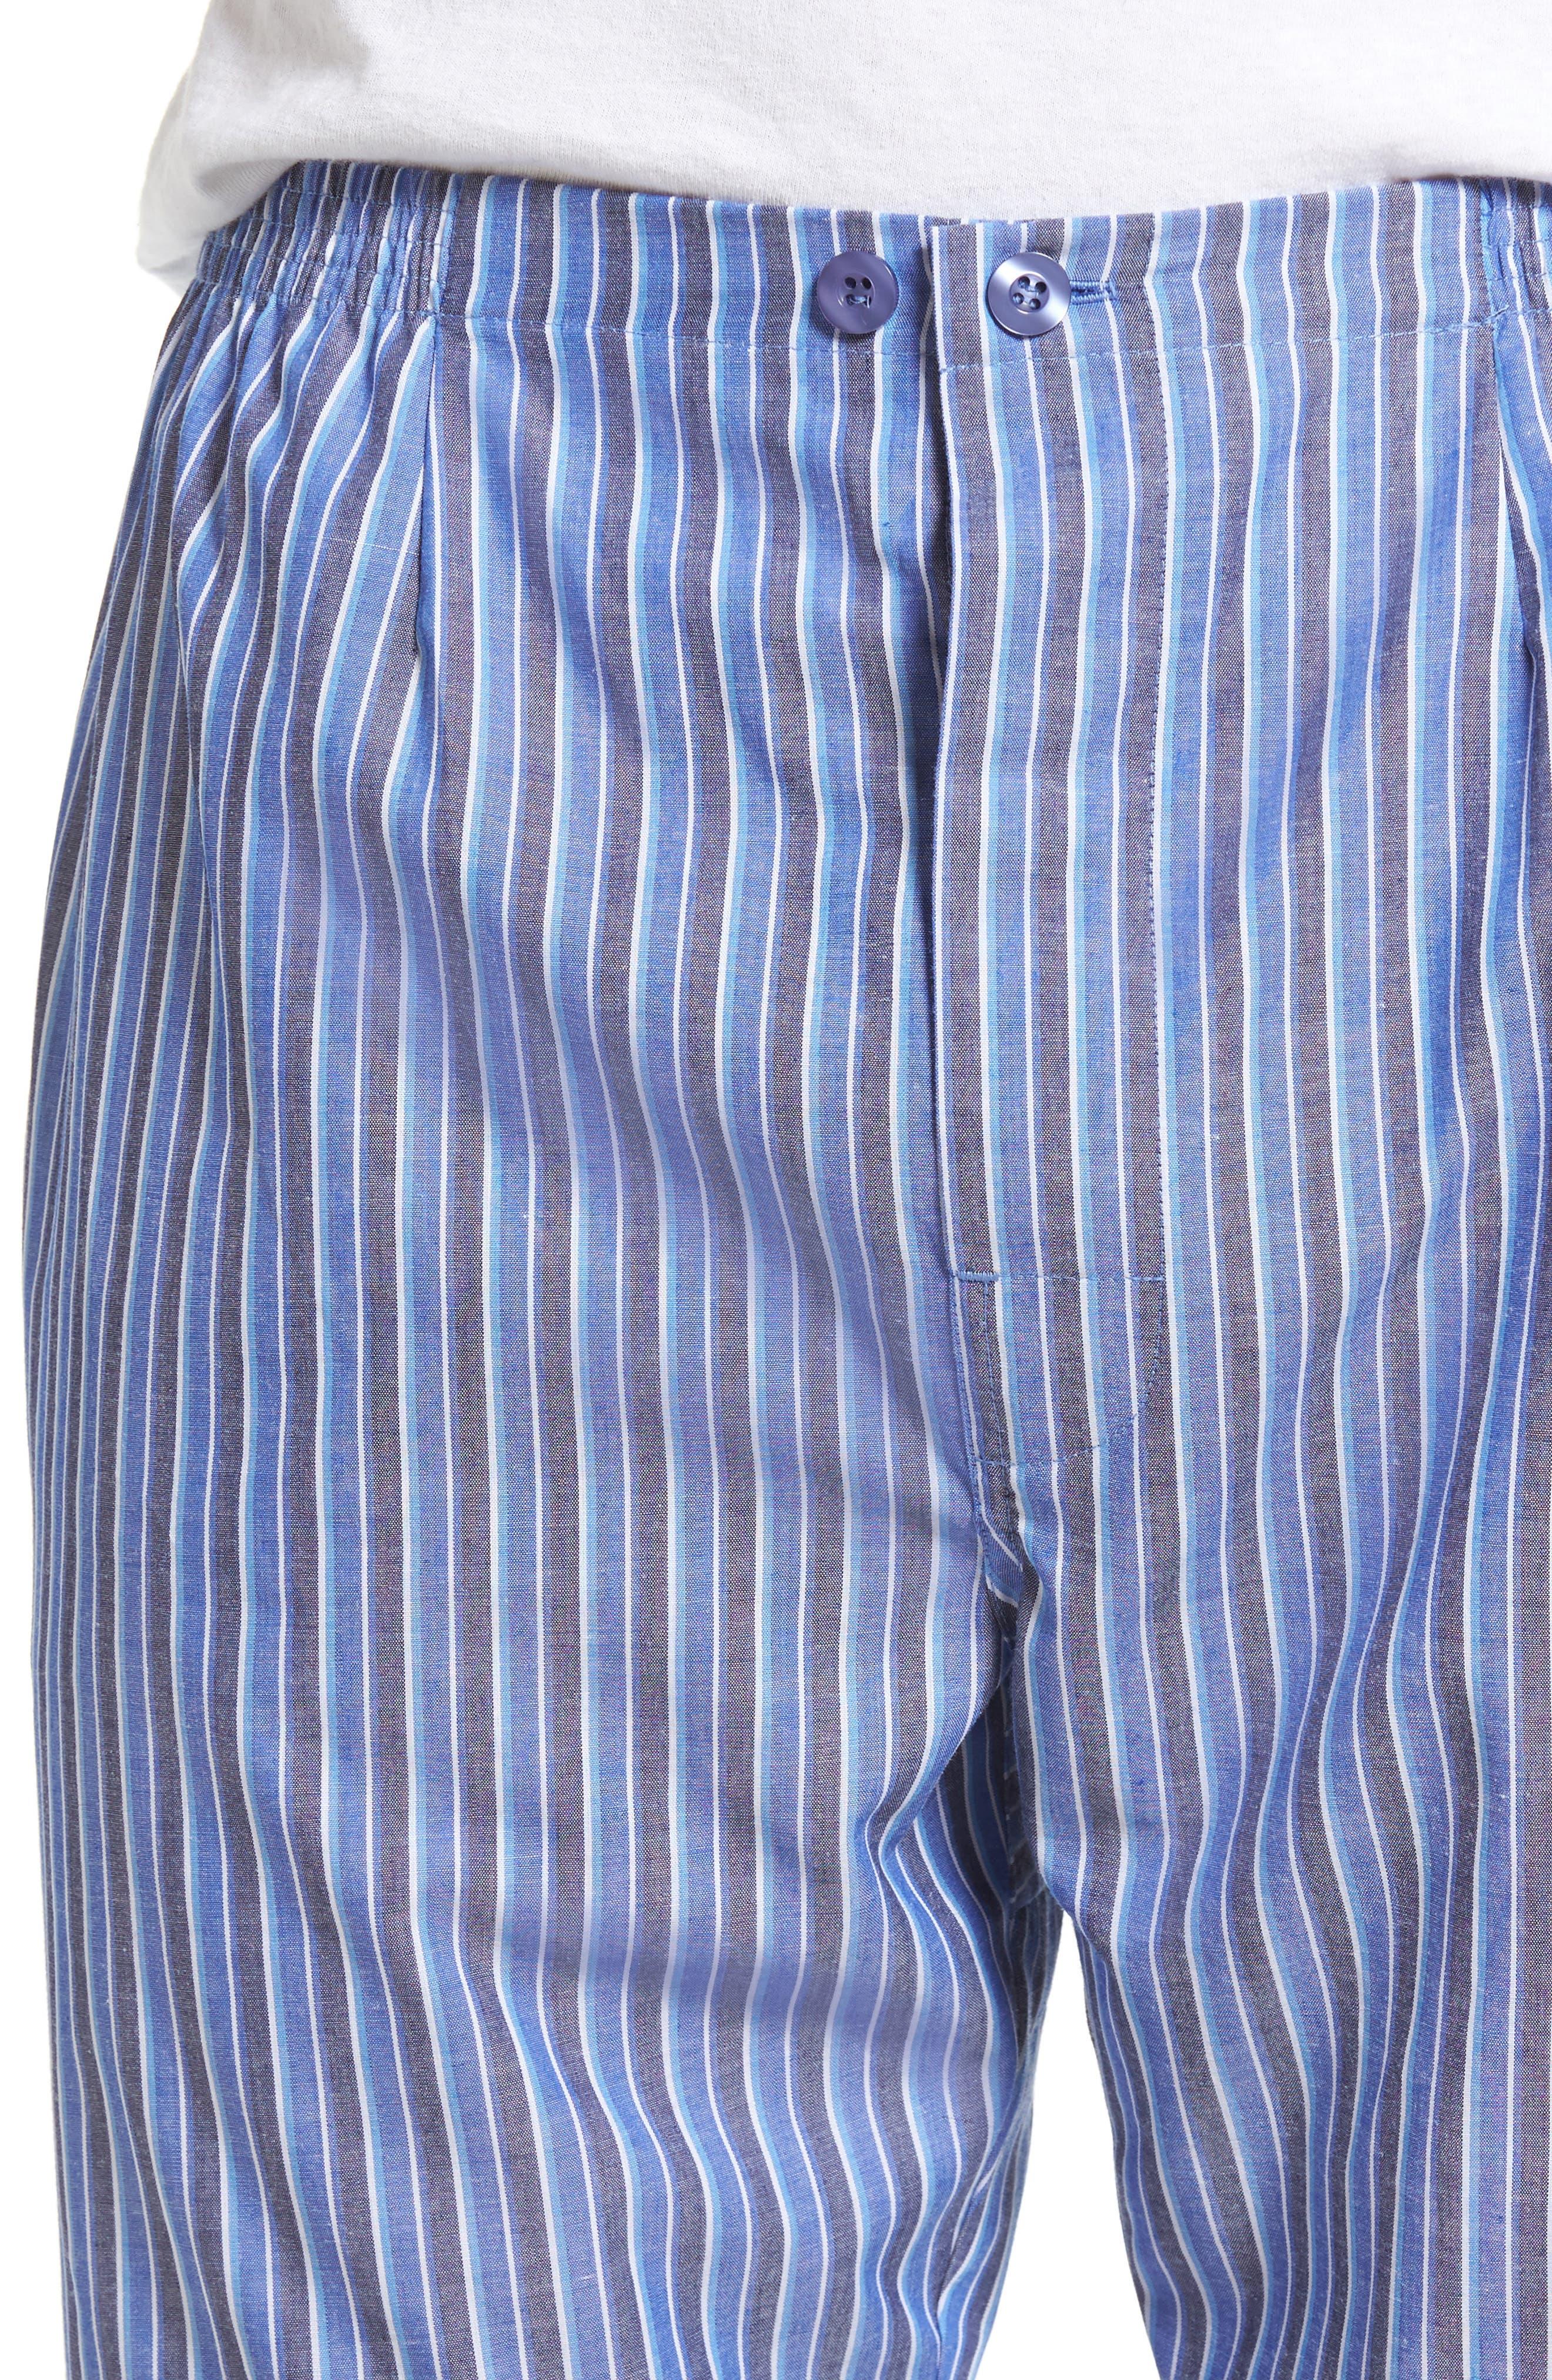 Cole Cotton Blend Pajama Set,                             Alternate thumbnail 4, color,                             Royal Stripe